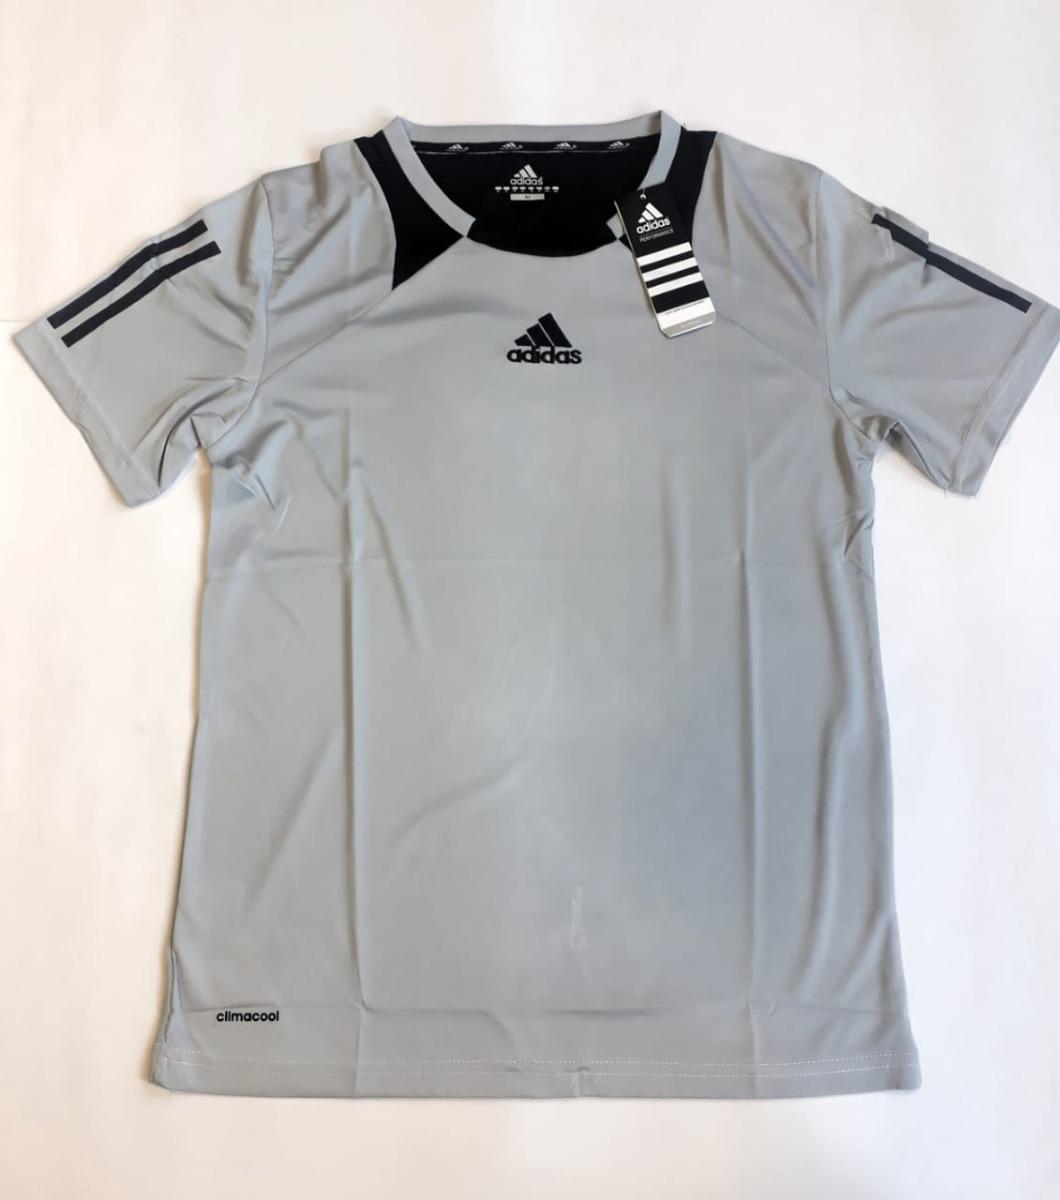 b1294f567 camisetas deportivas para hombre adidas nike under armour. Cargando zoom.